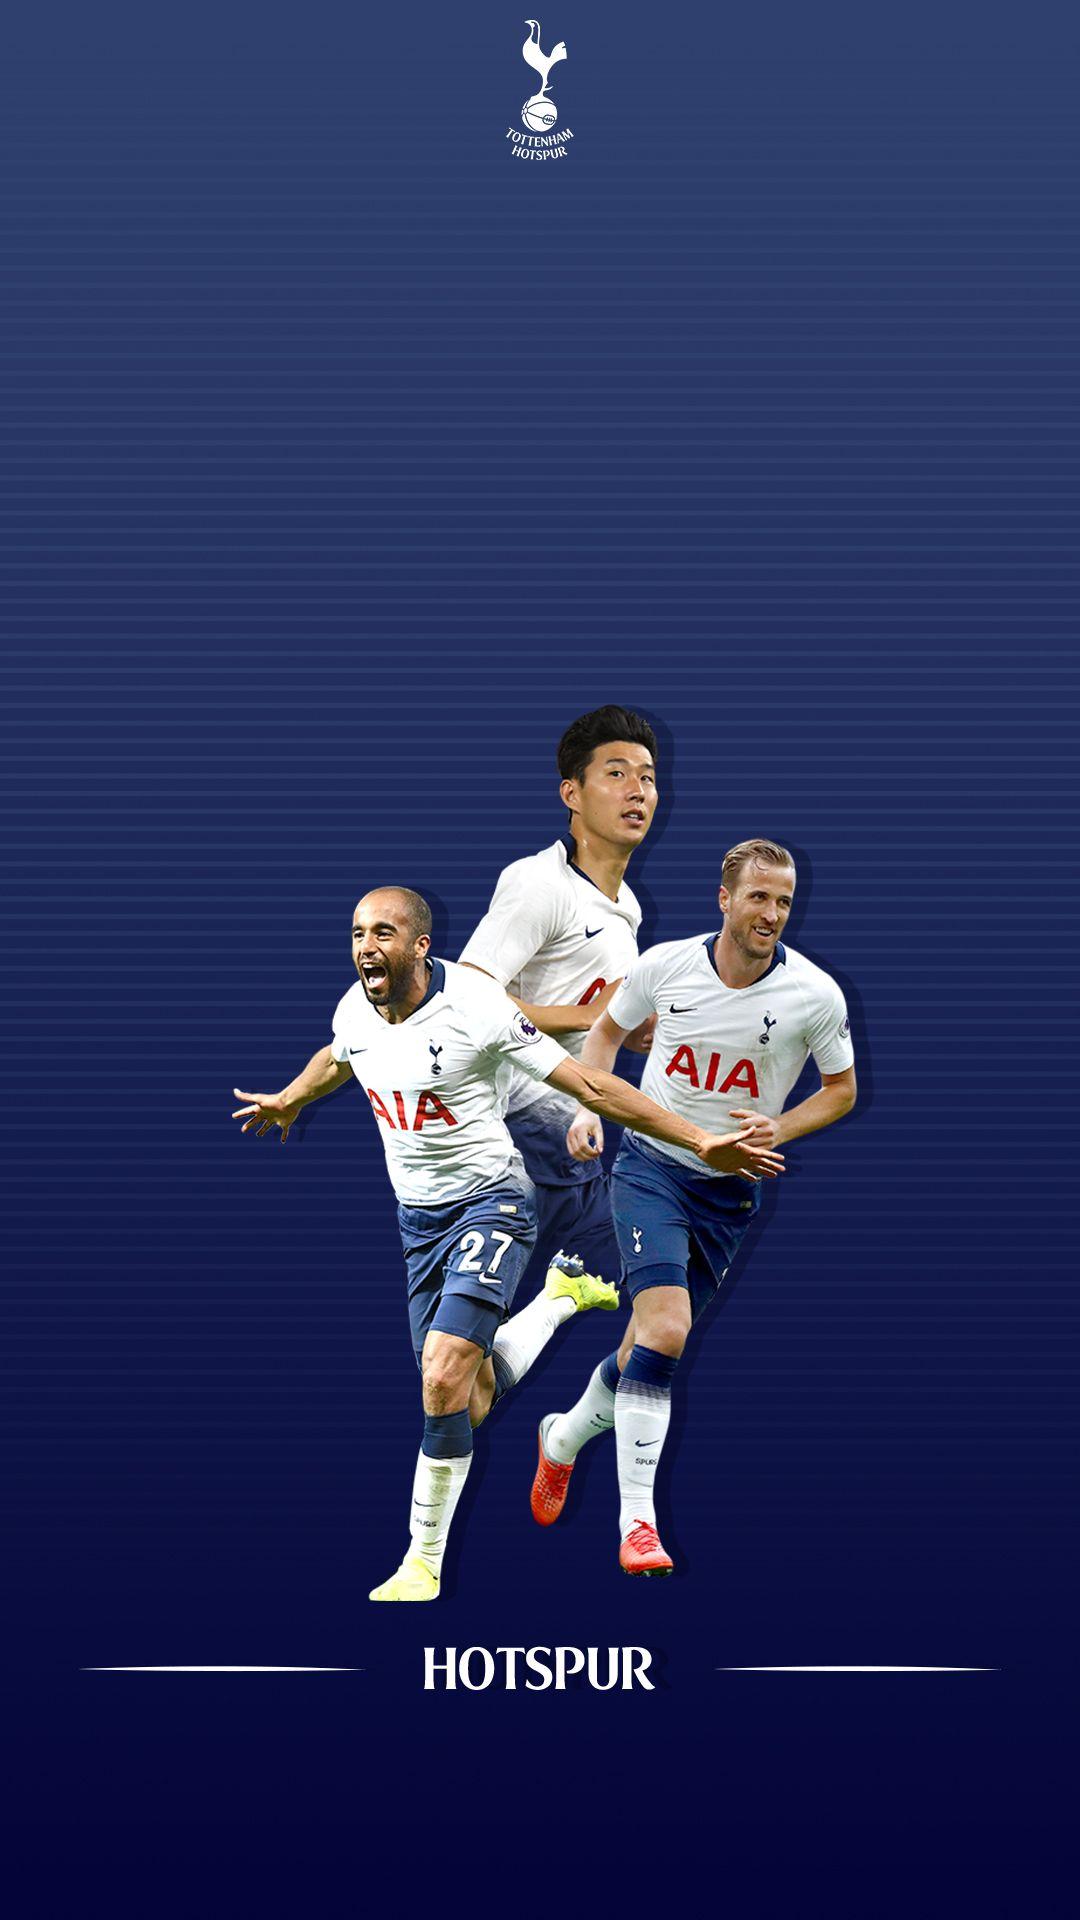 Tottenham Hotspur F C Football Harry Kane Son Heung Min Jogadores De Futebol Futebol Clube